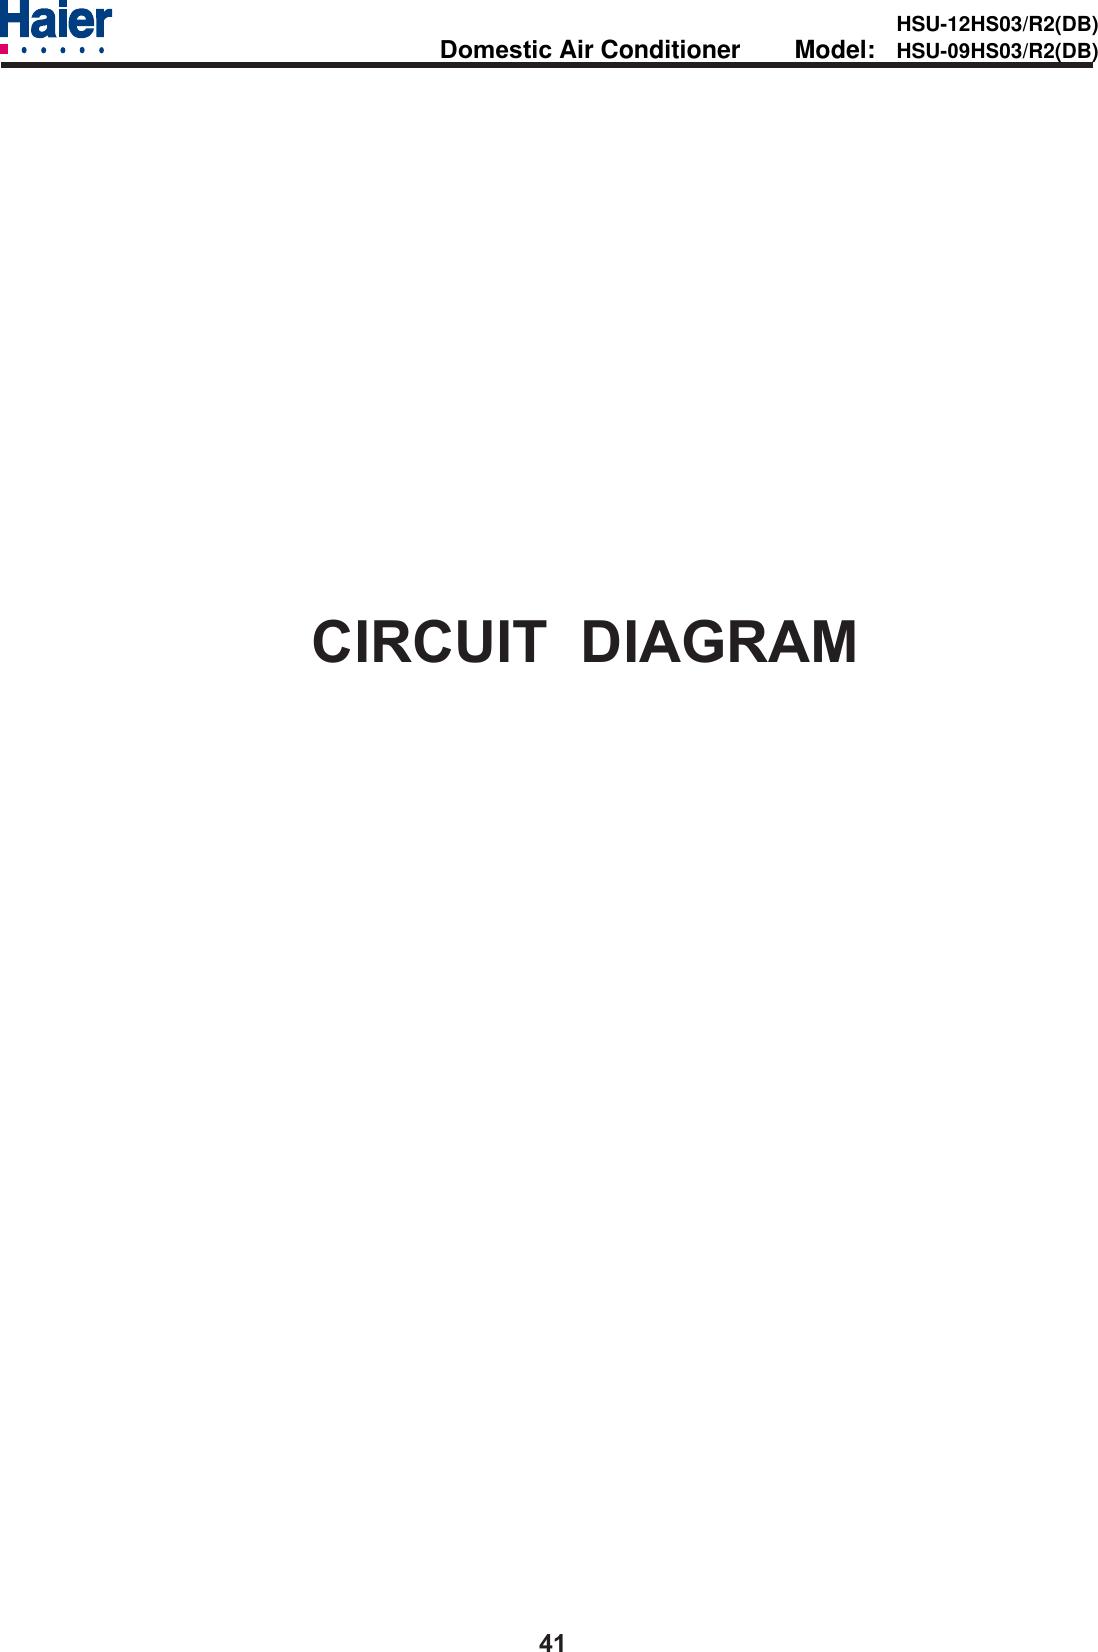 Haier Hsu 09Hs03 R2Db Users Manual on dcs wiring diagram, manufacturing wiring diagram, estate wiring diagram, benq wiring diagram, broan wiring diagram, o2 wiring diagram, msi wiring diagram, foscam wiring diagram, toshiba wiring diagram, crosley wiring diagram, apc wiring diagram, roper wiring diagram, panasonic wiring diagram, apple wiring diagram, vivitar wiring diagram, danby wiring diagram, midea wiring diagram, sears wiring diagram, viking wiring diagram, braun wiring diagram,